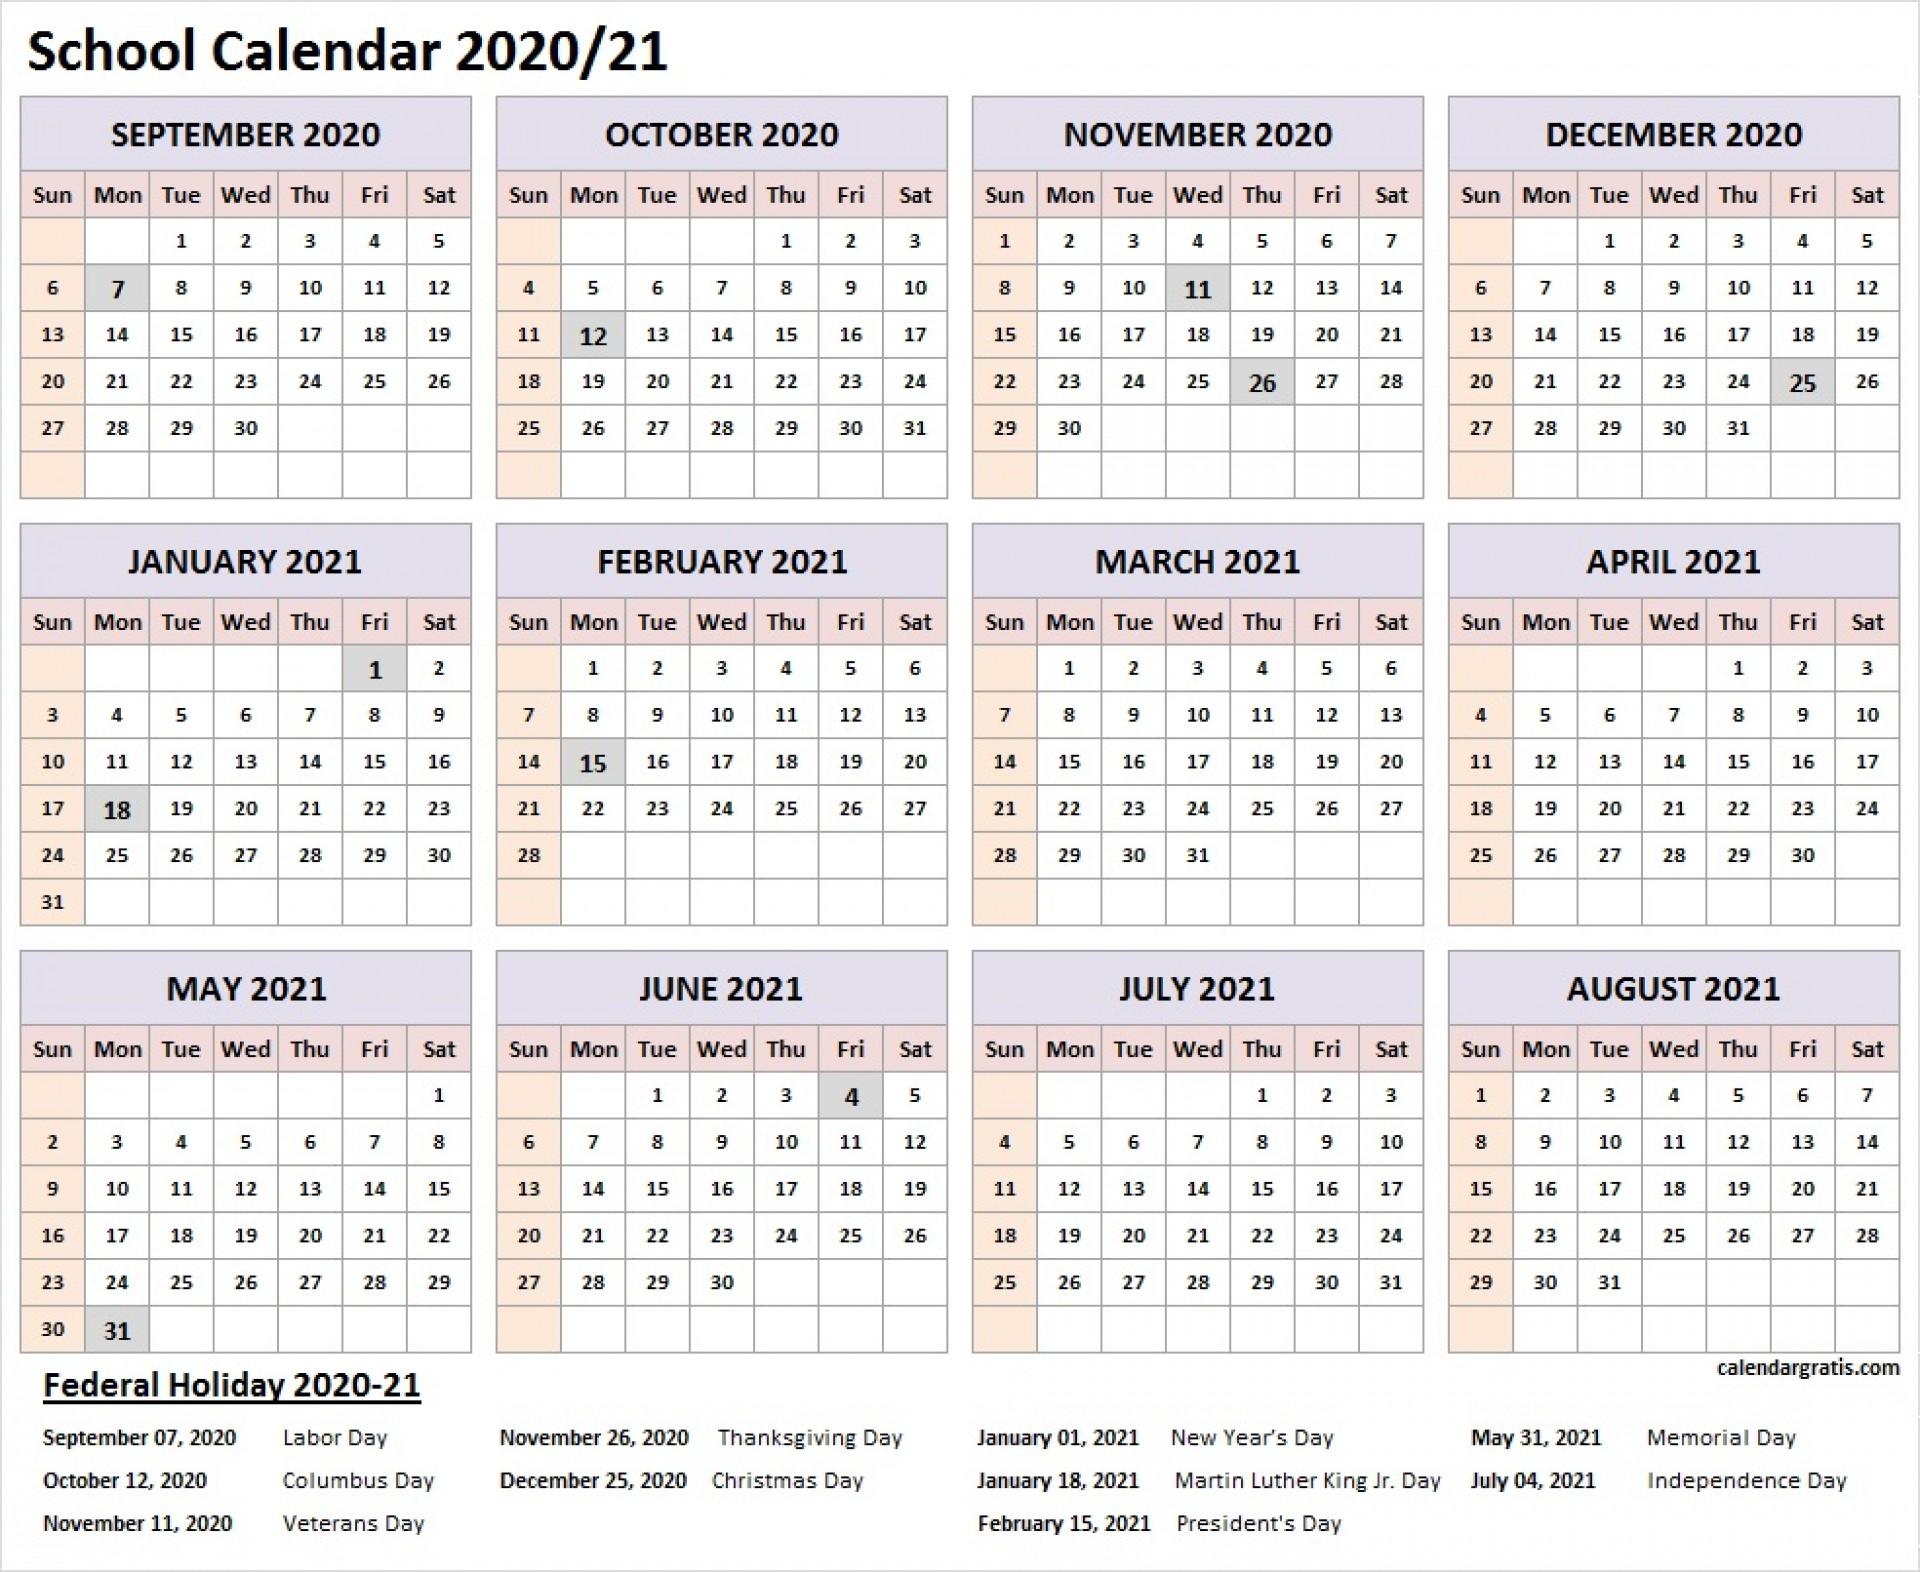 006 Wonderful School Year Calendar Template Highest Clarity  Excel 2019-20 Word1920